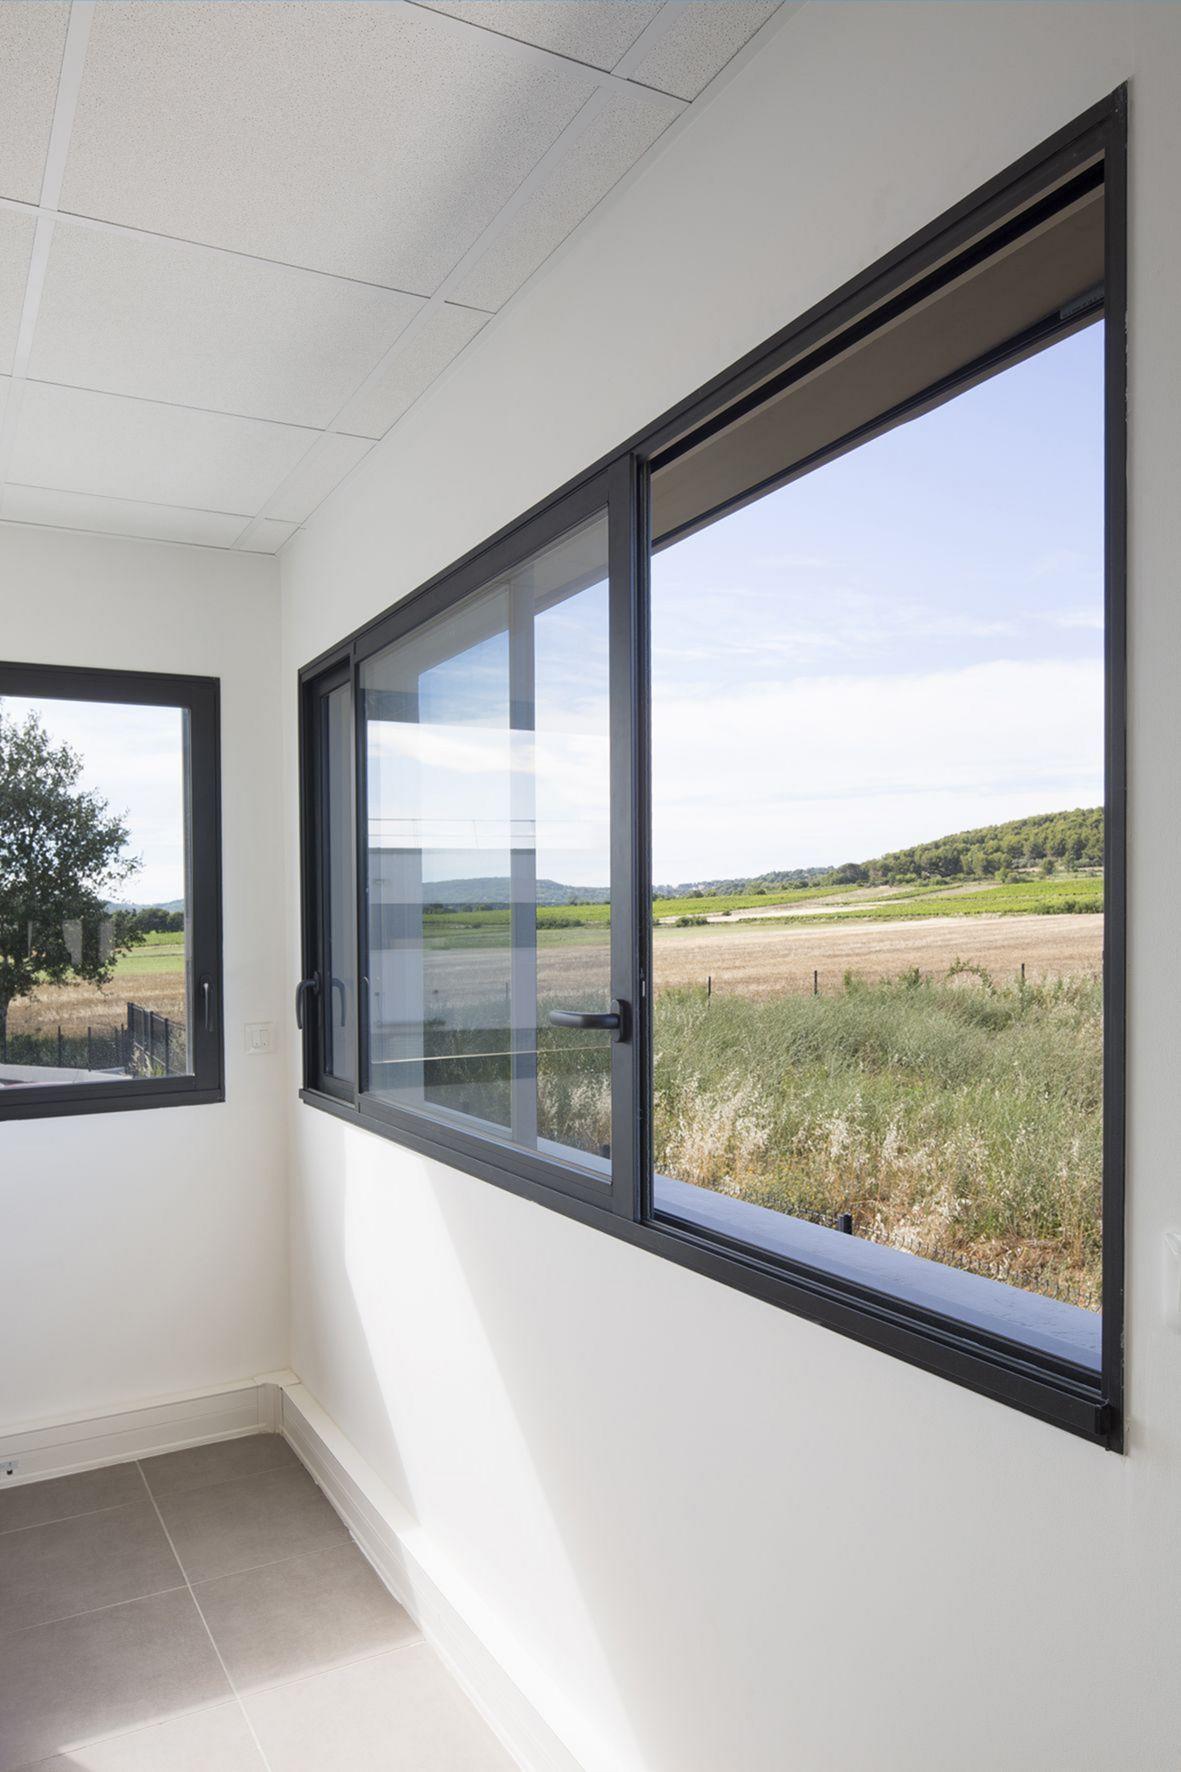 15 Minimalist Window Design Ideas For You To Realize In Your Home Modern Window Design Minimalist Window Modern Windows